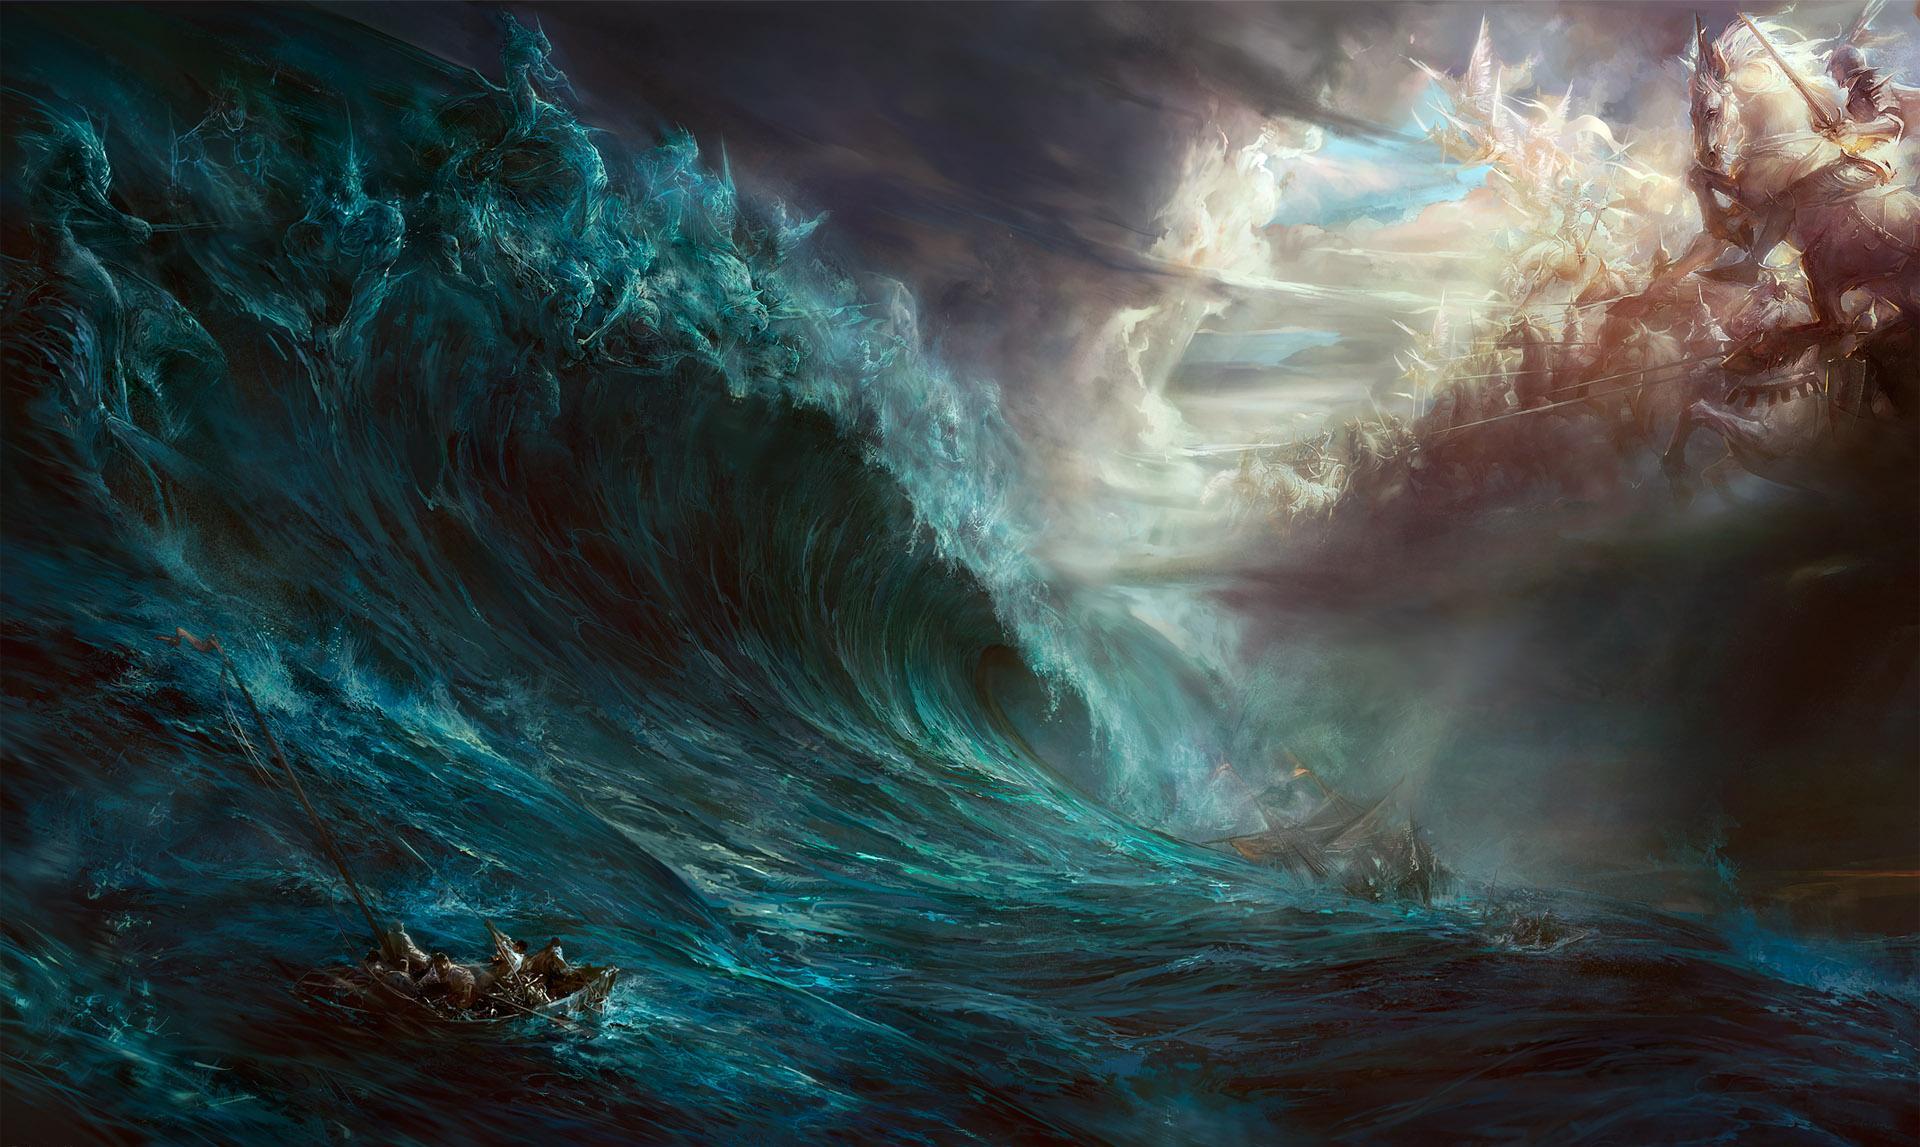 Fantasy - Gods  Wave Water Sea Bakgrund